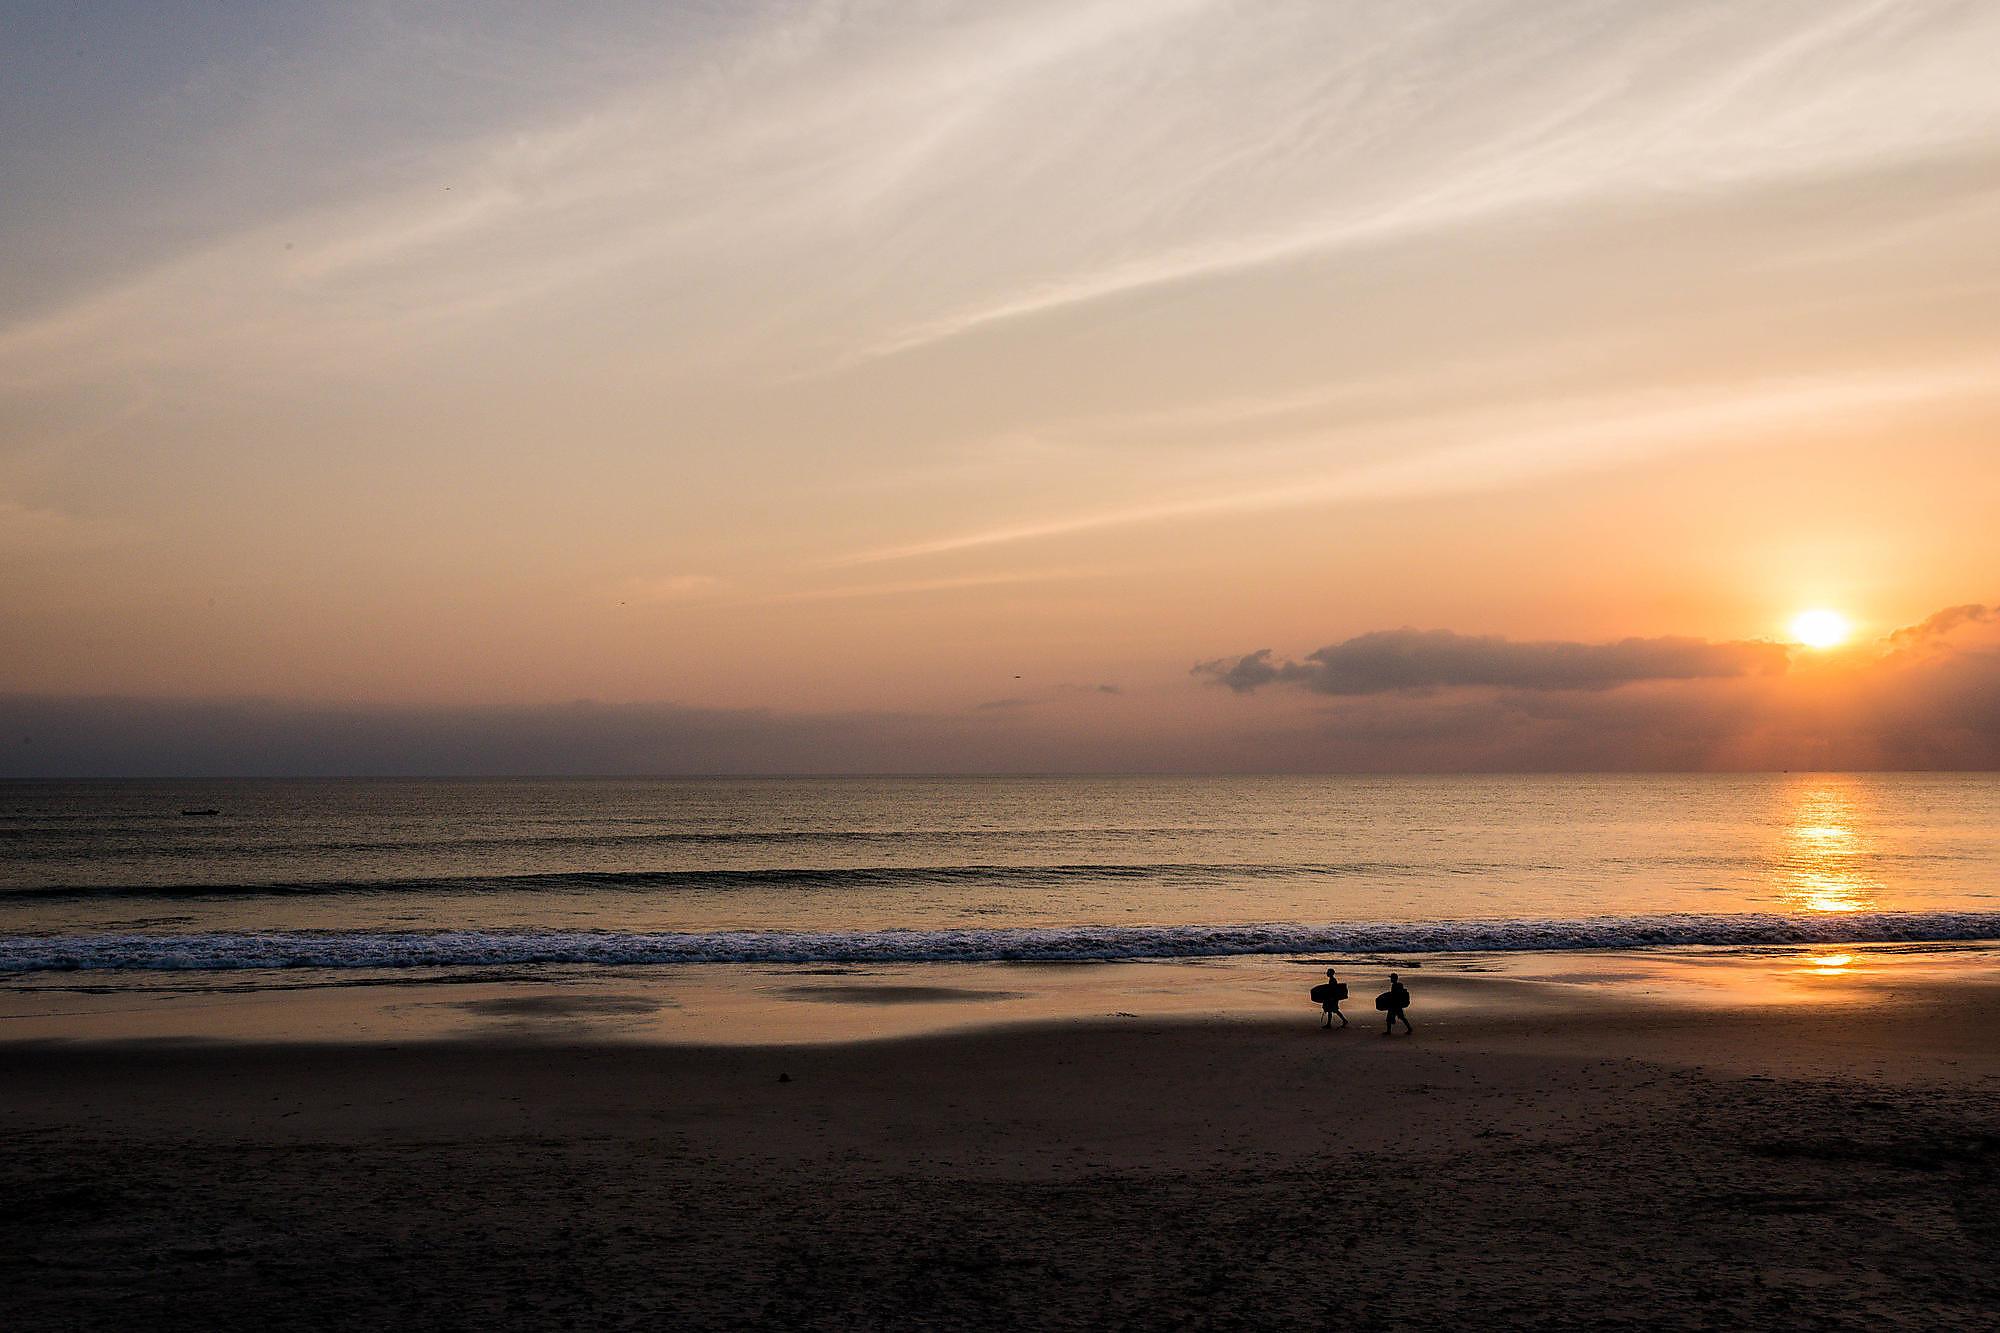 Sunset over the beach at W Punta Mita